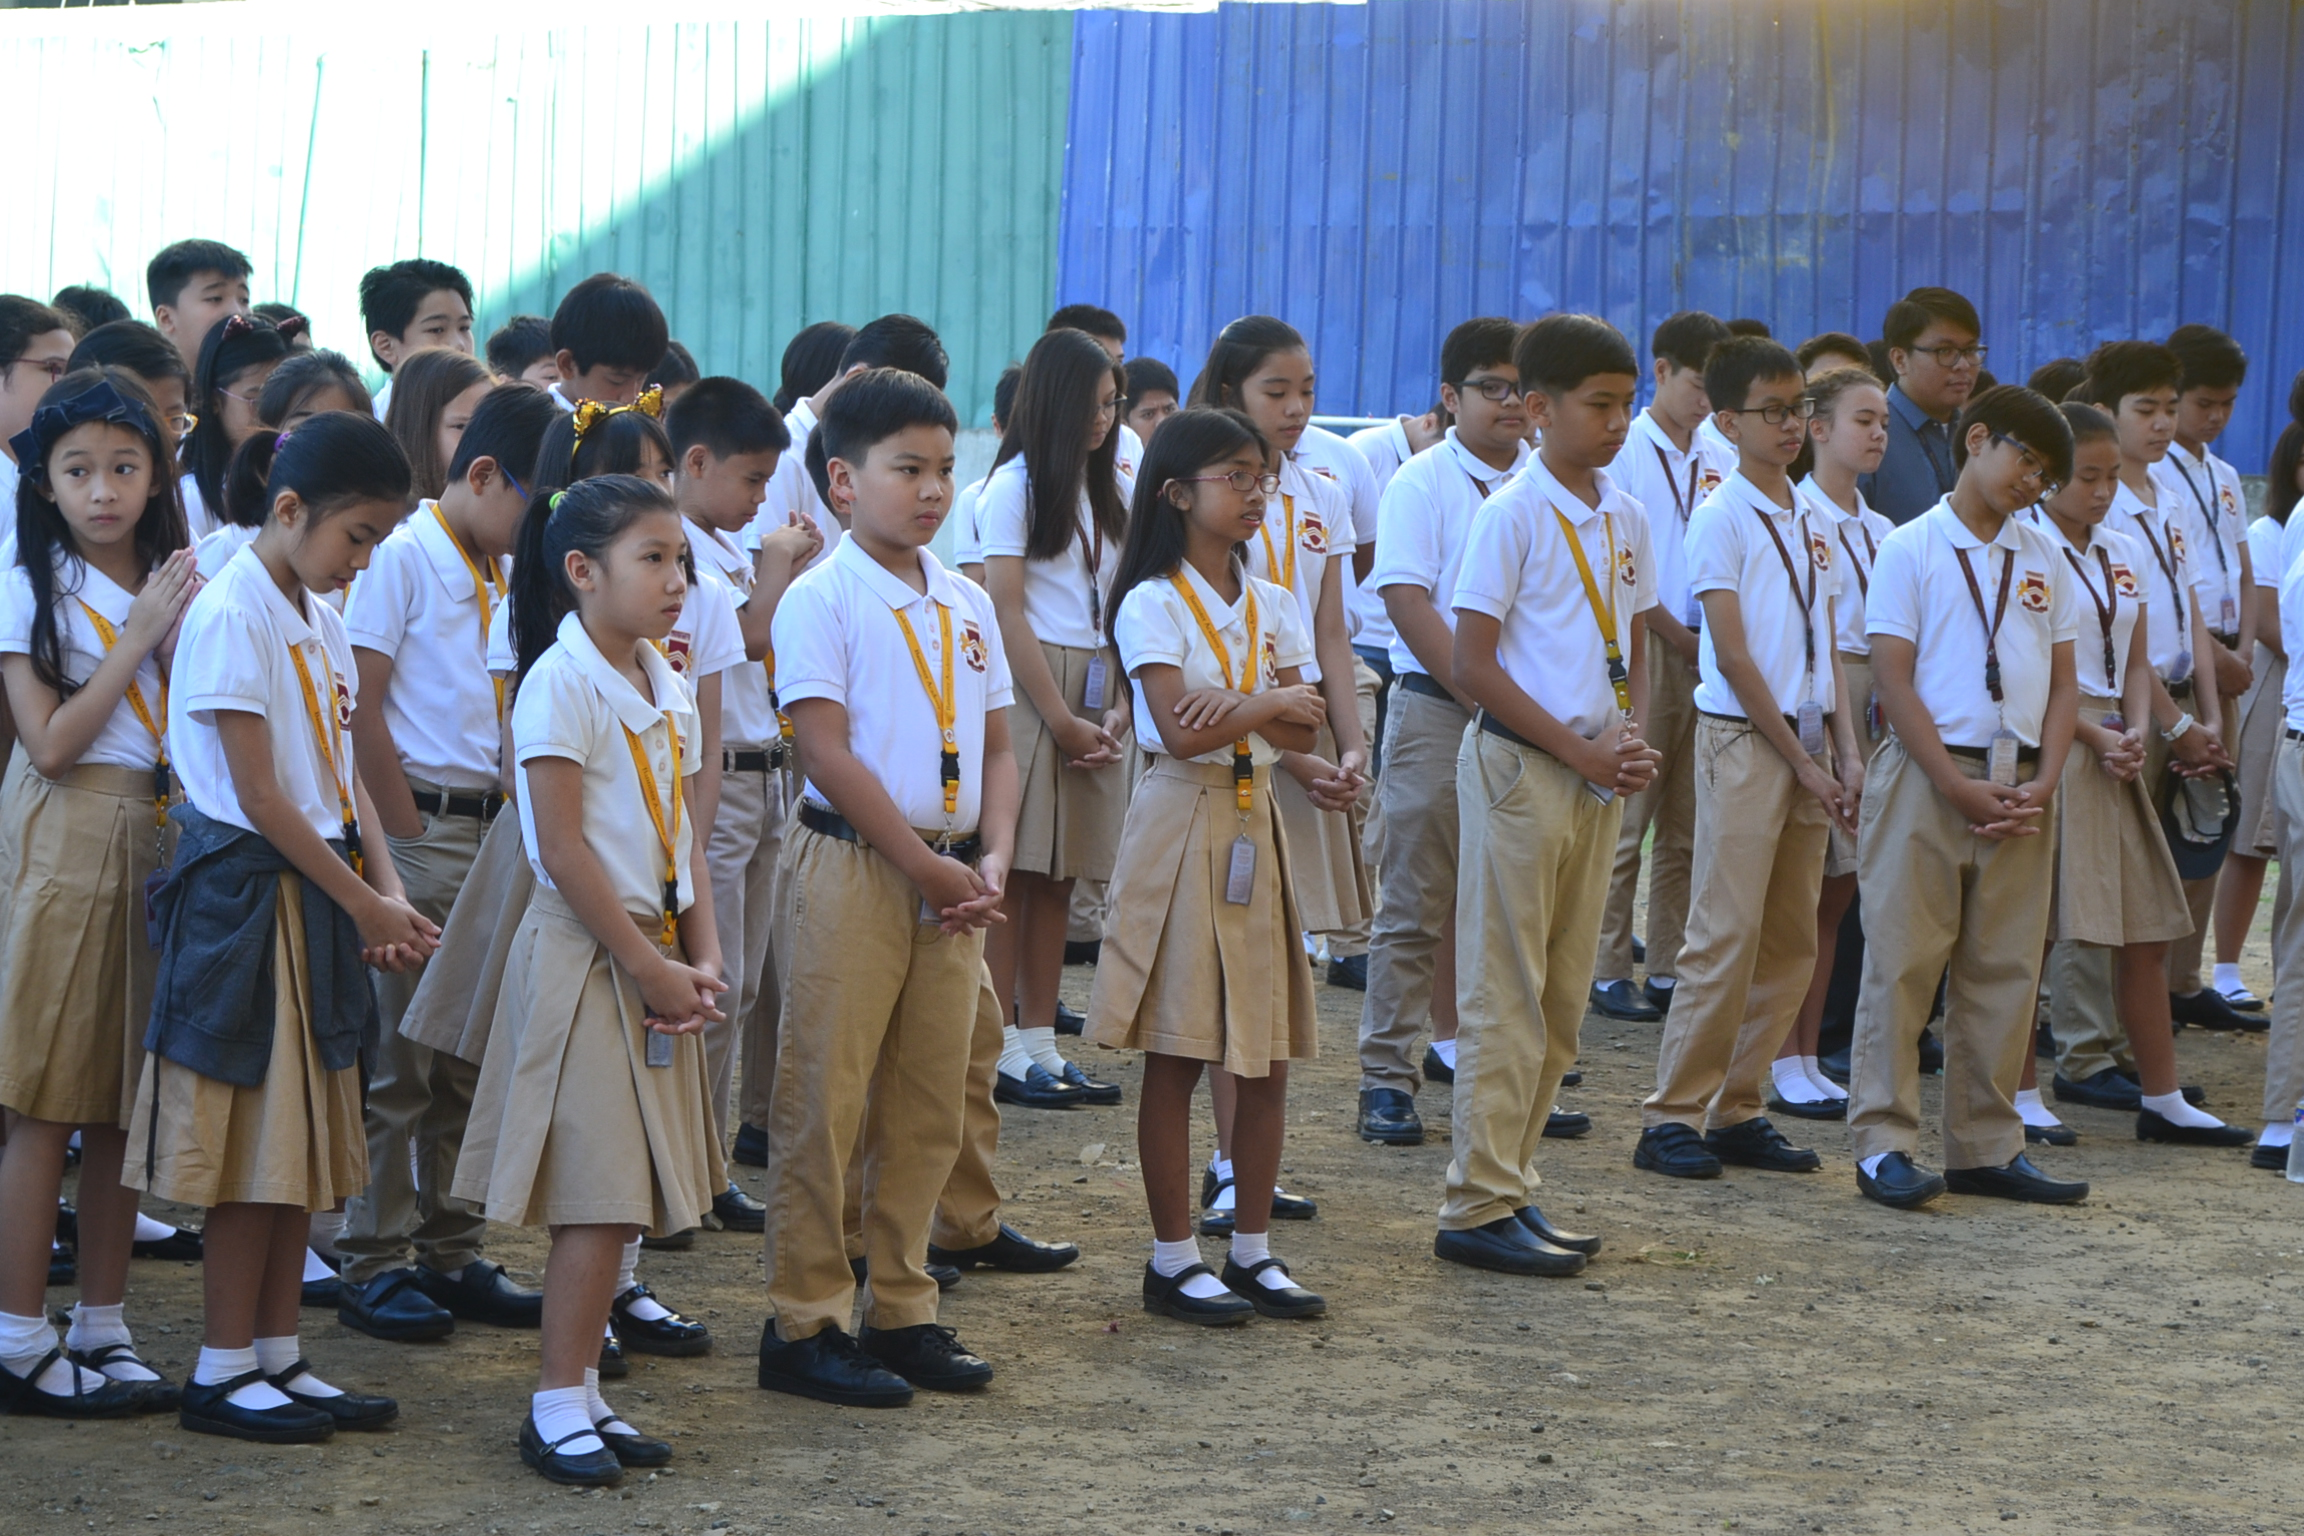 Assembly Grounds Photo 4